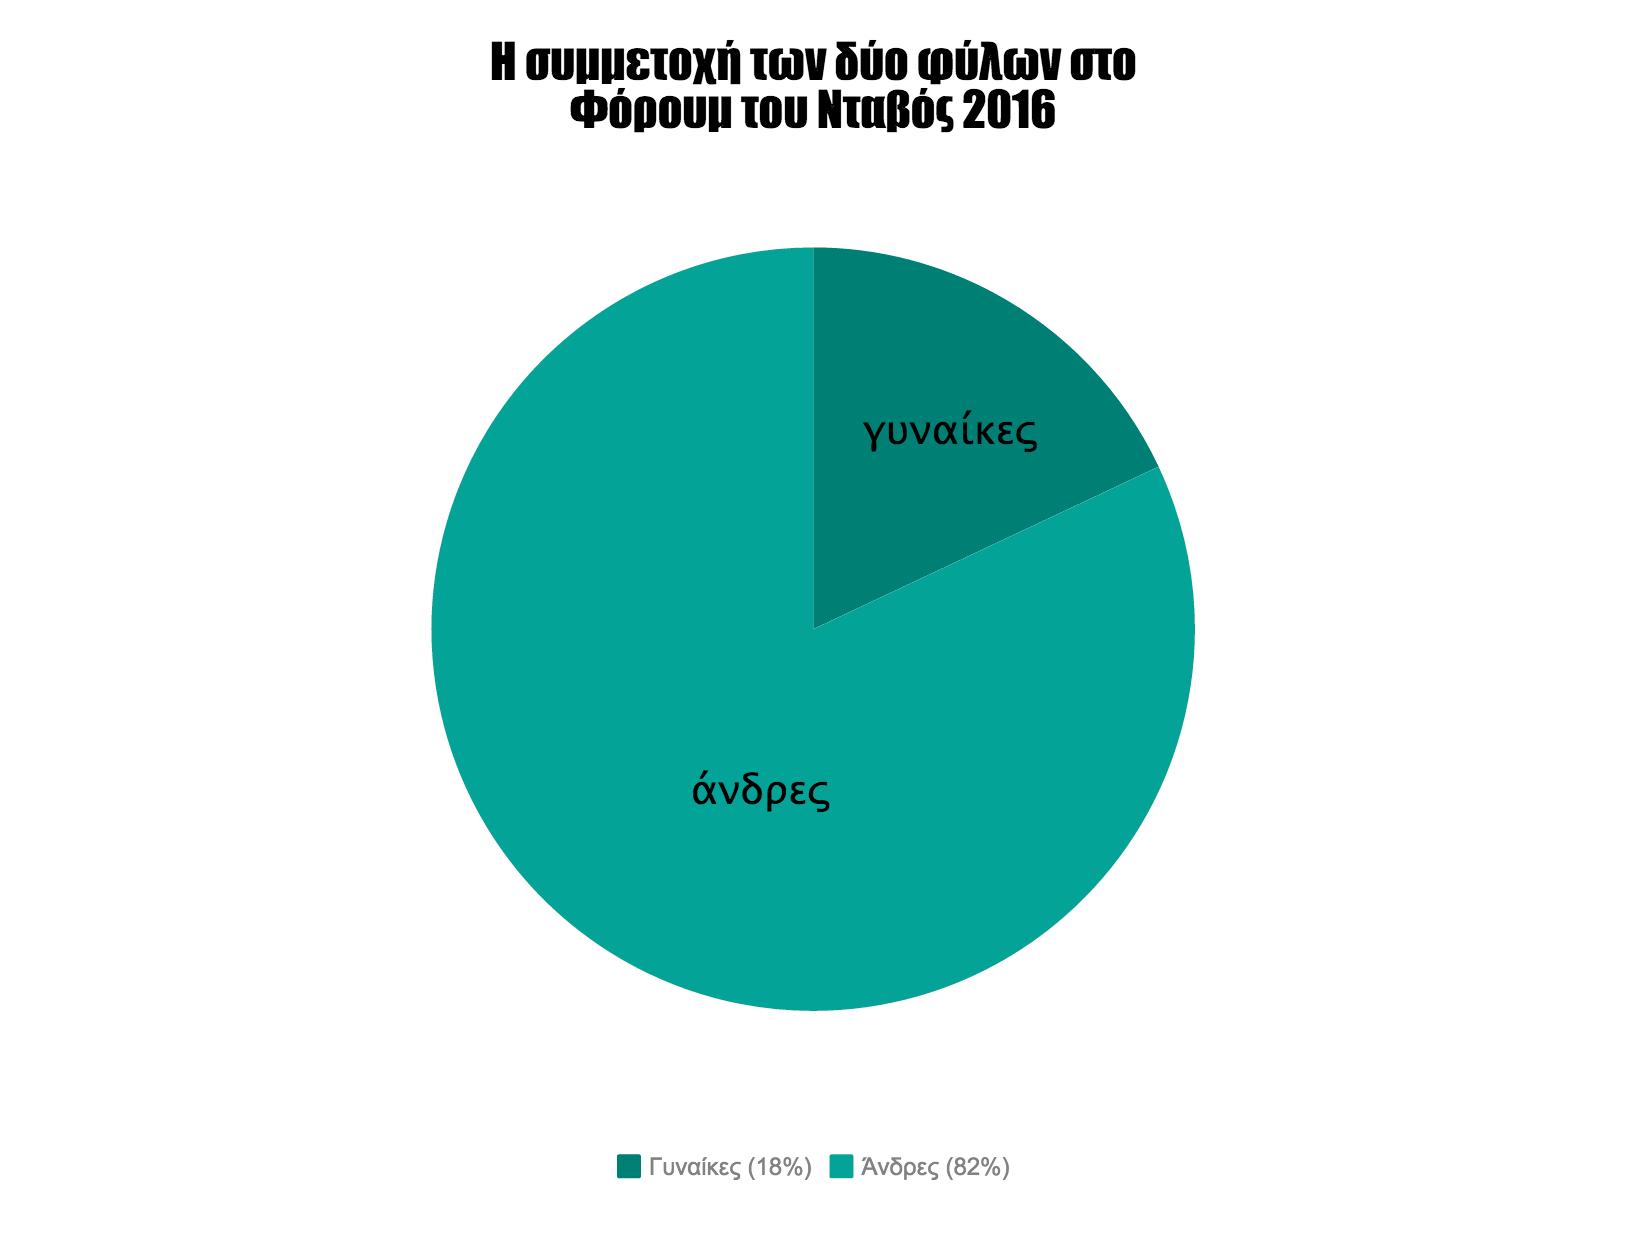 graph1_copy.png